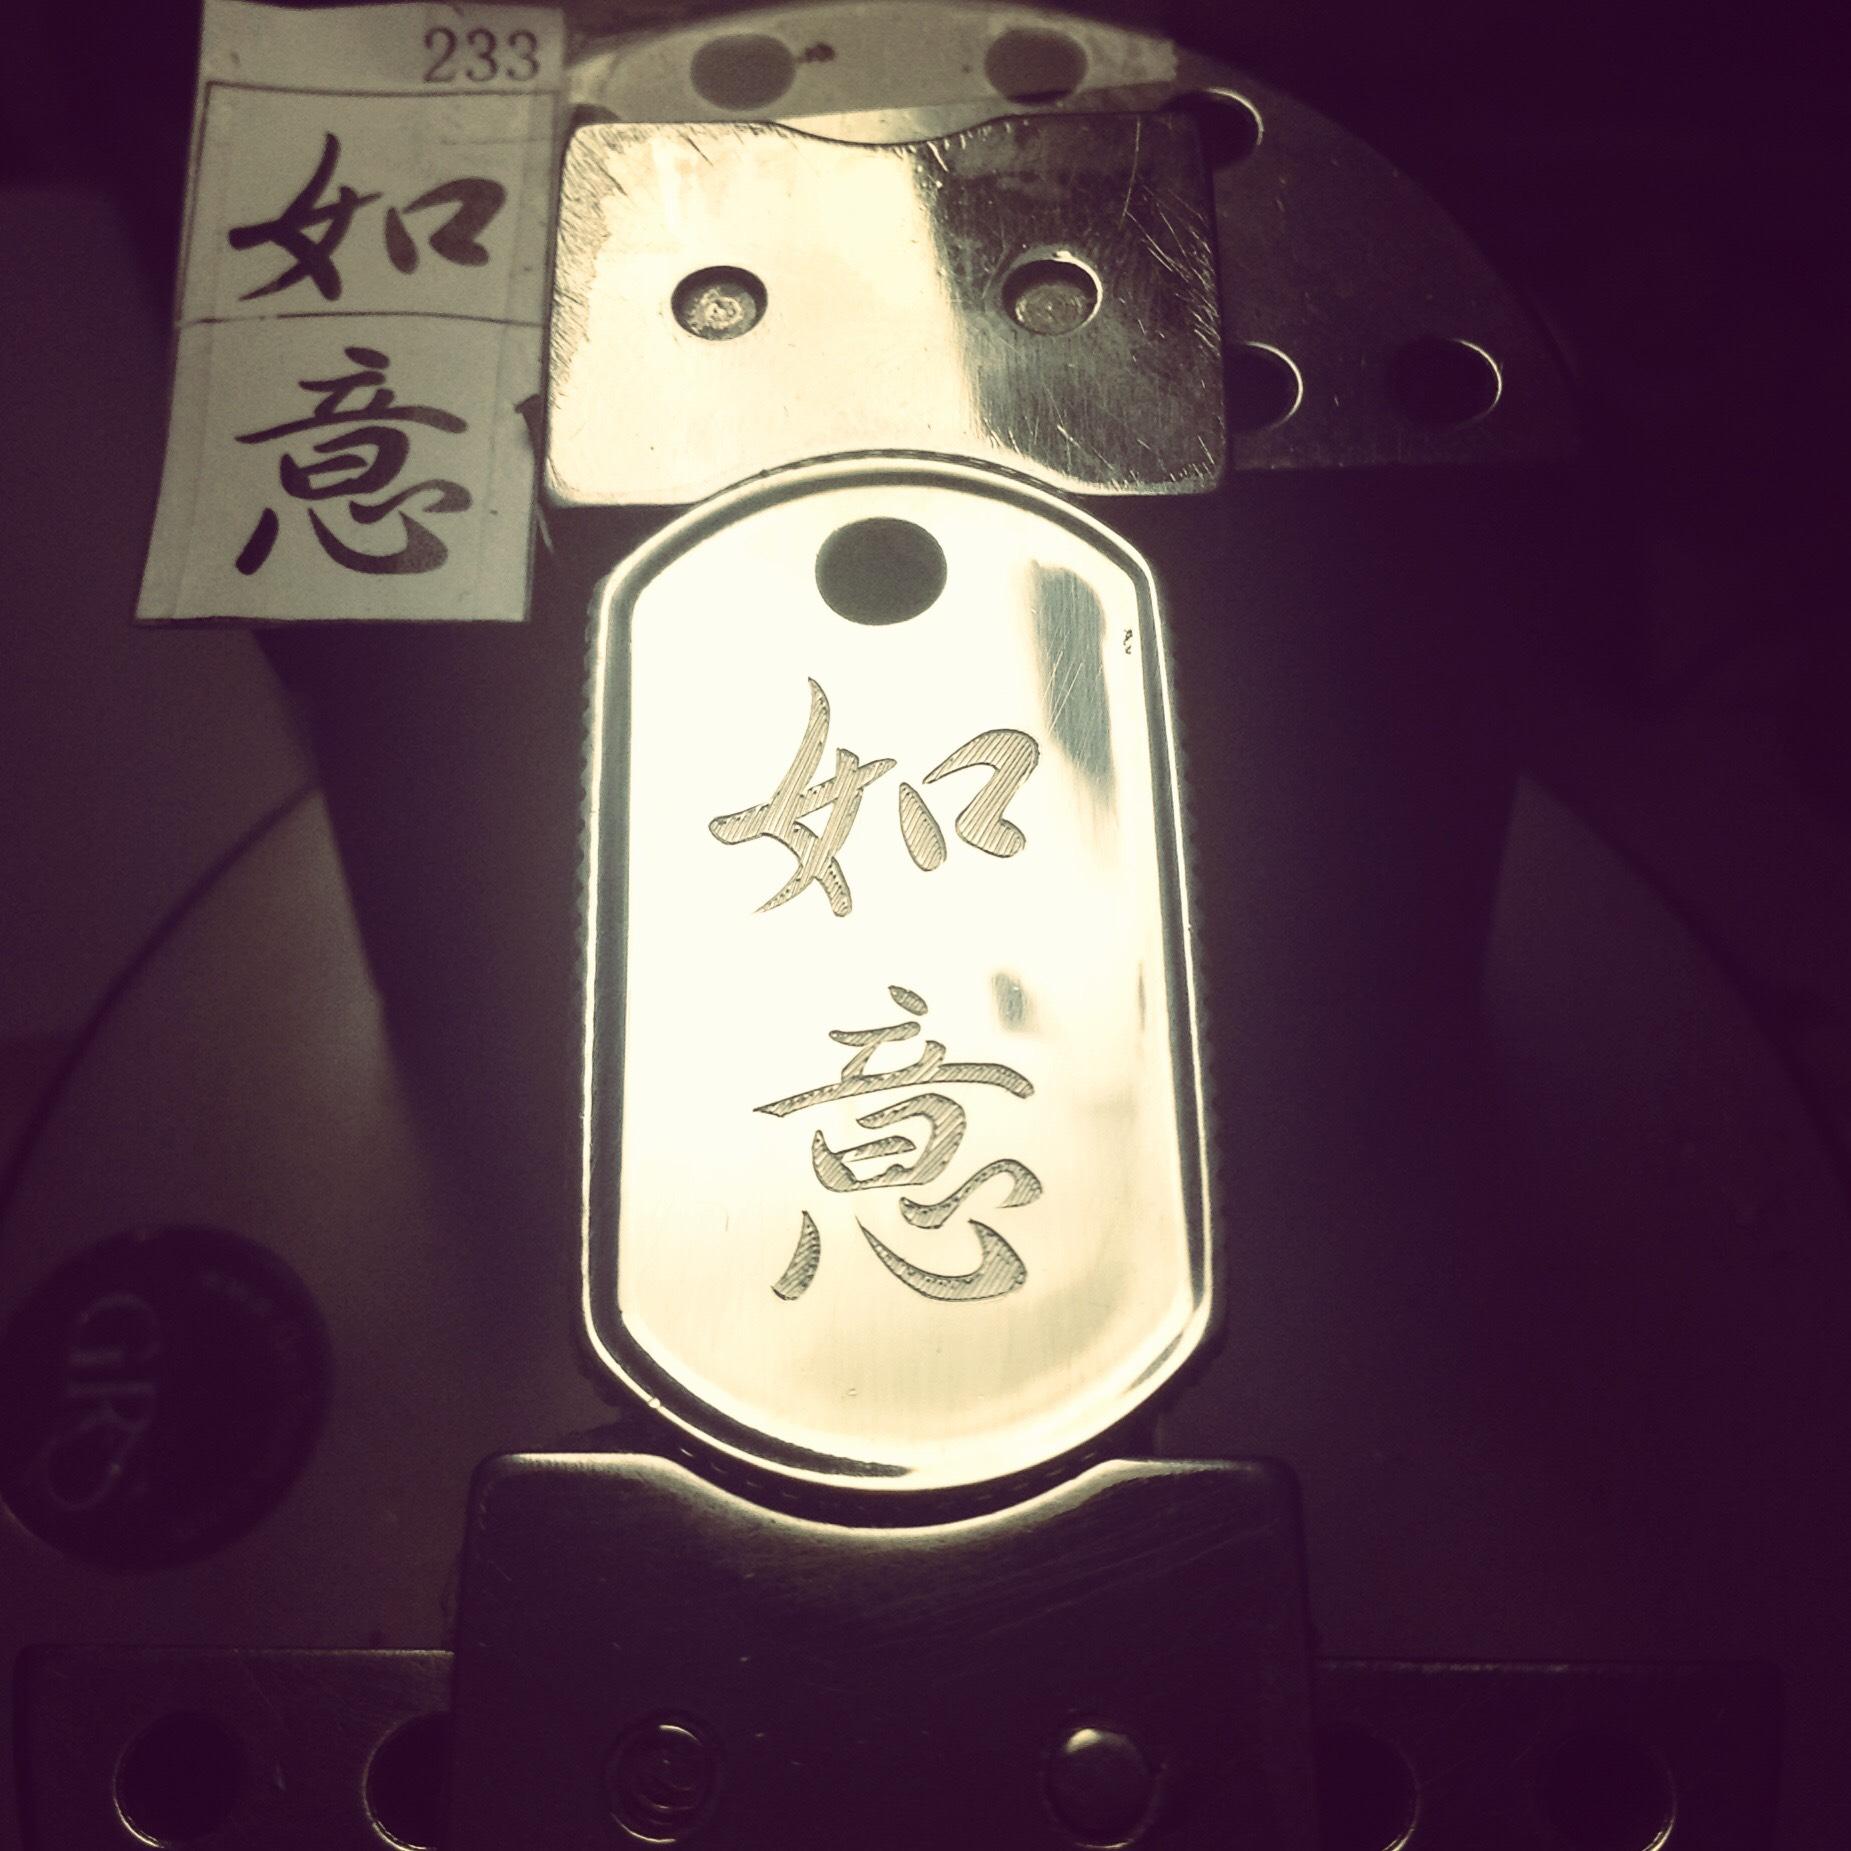 Chinese Caligraphy Engraving.jpeg